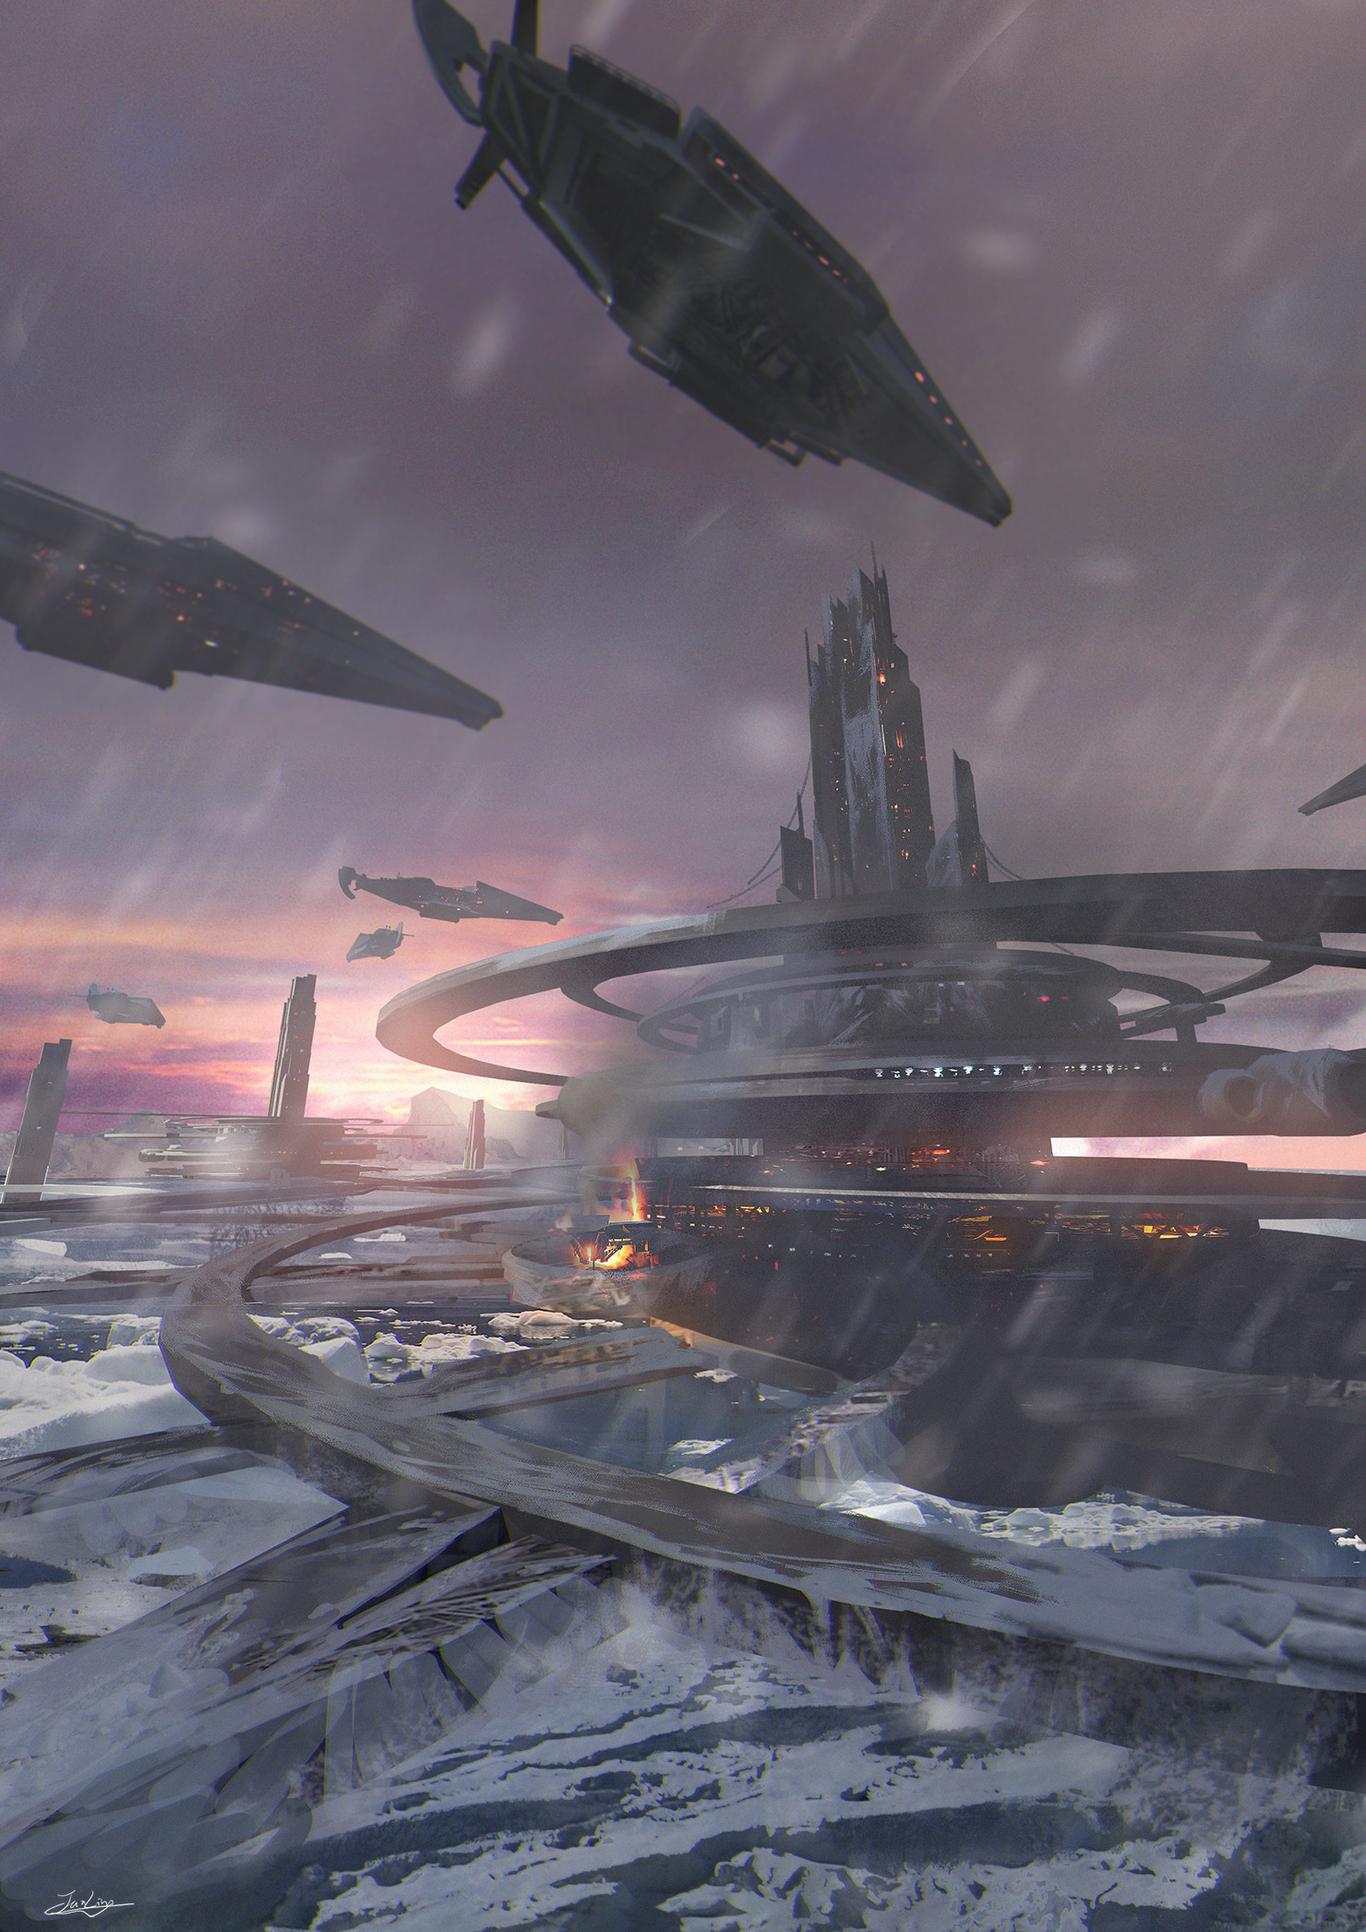 Science fiction scene in the snow